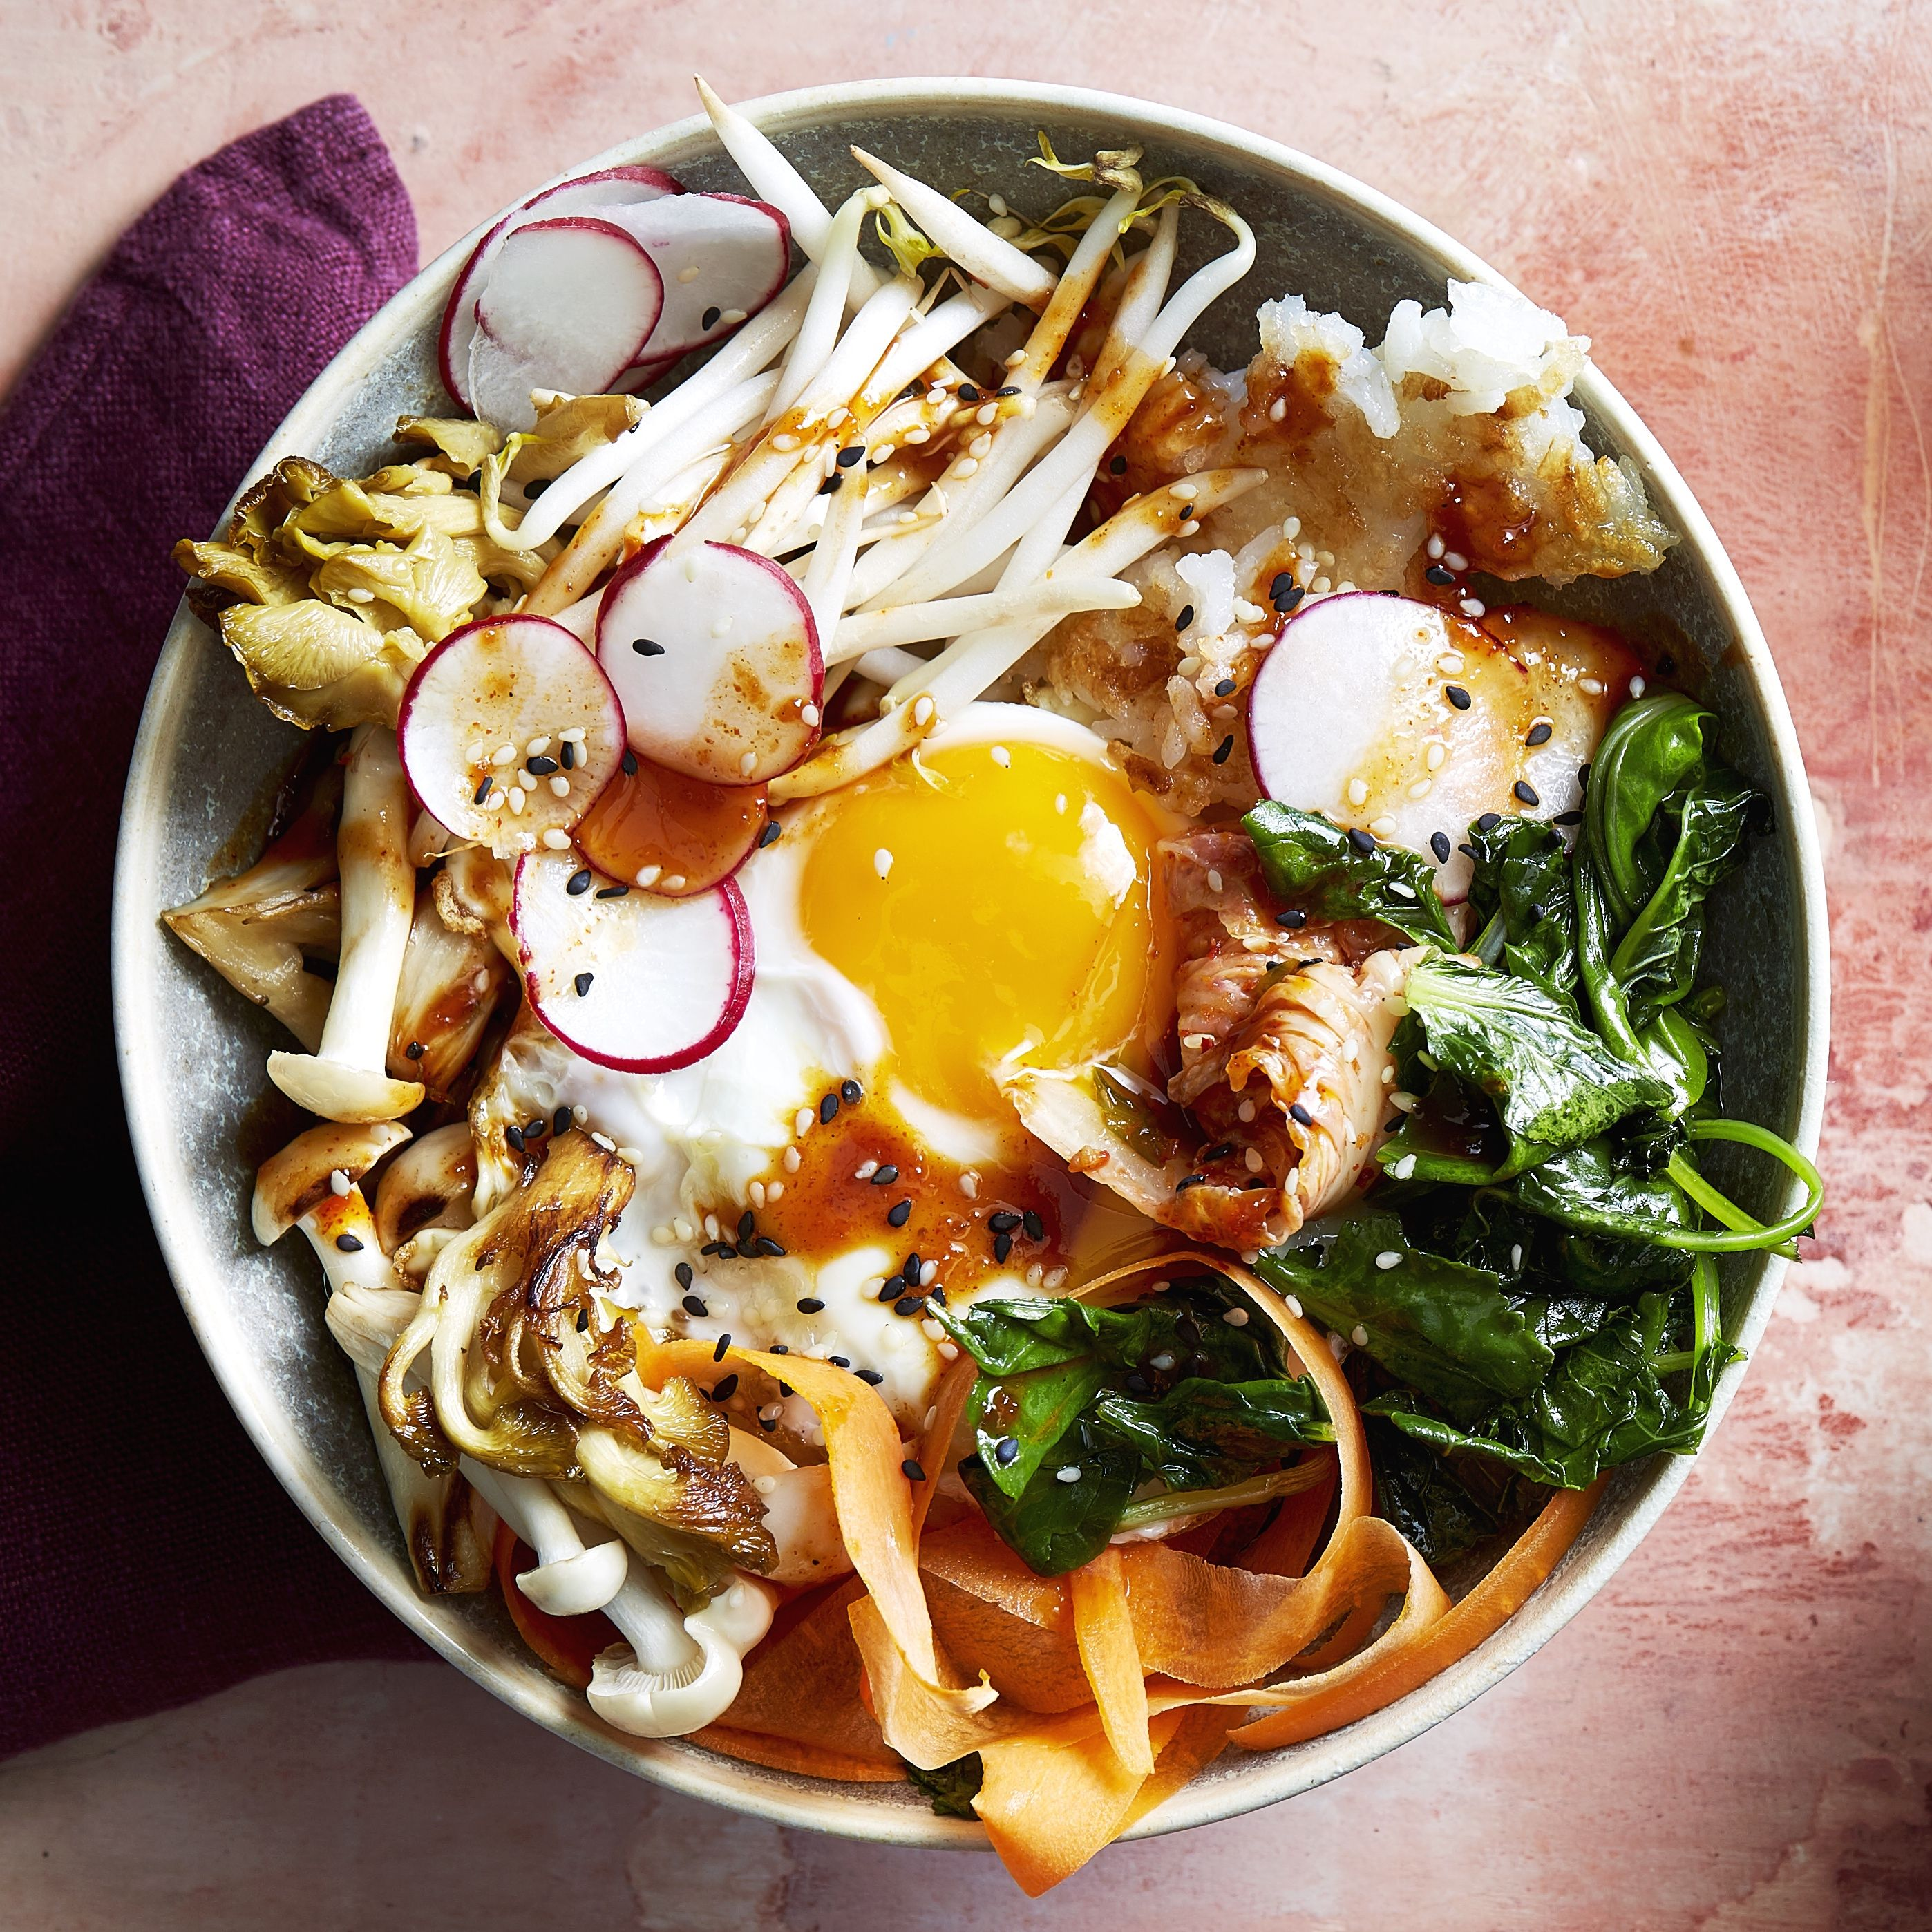 Korean Bibimbap Bowls Recipe How To Make Bibimbap At Home